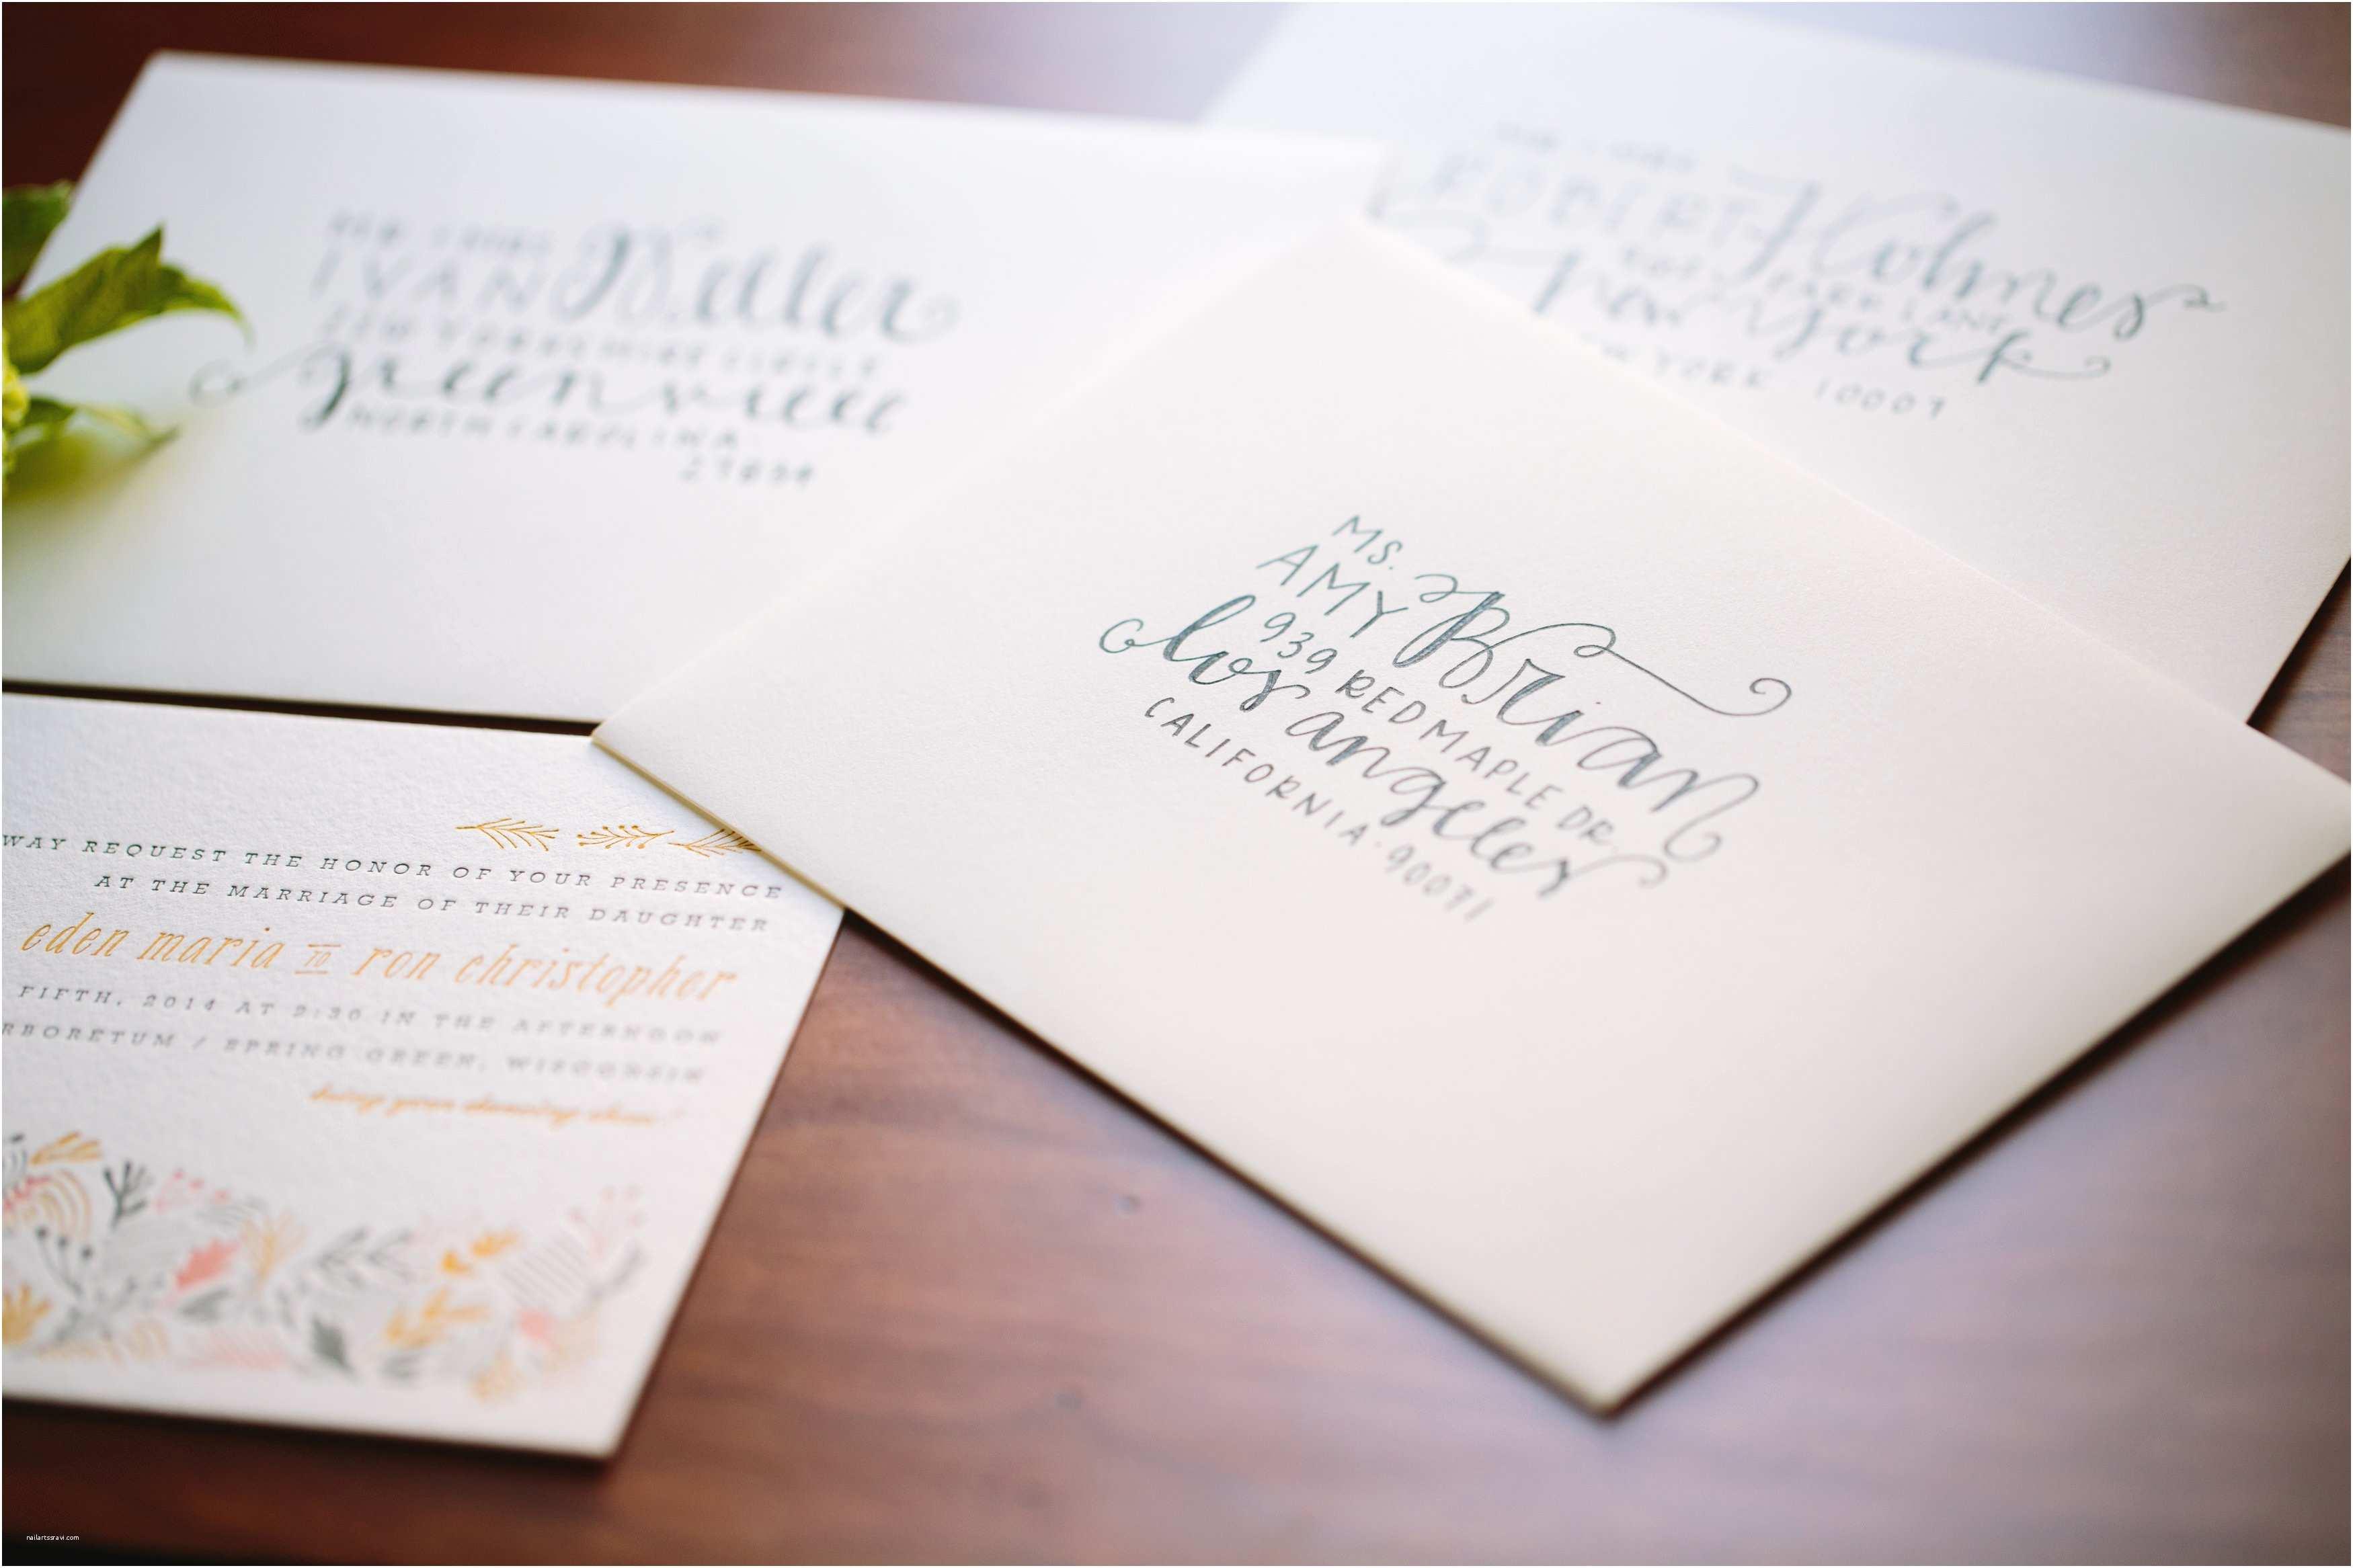 Wedding Invitation Addressing Service How to Wedding Invitation Address Etiquette Designs with